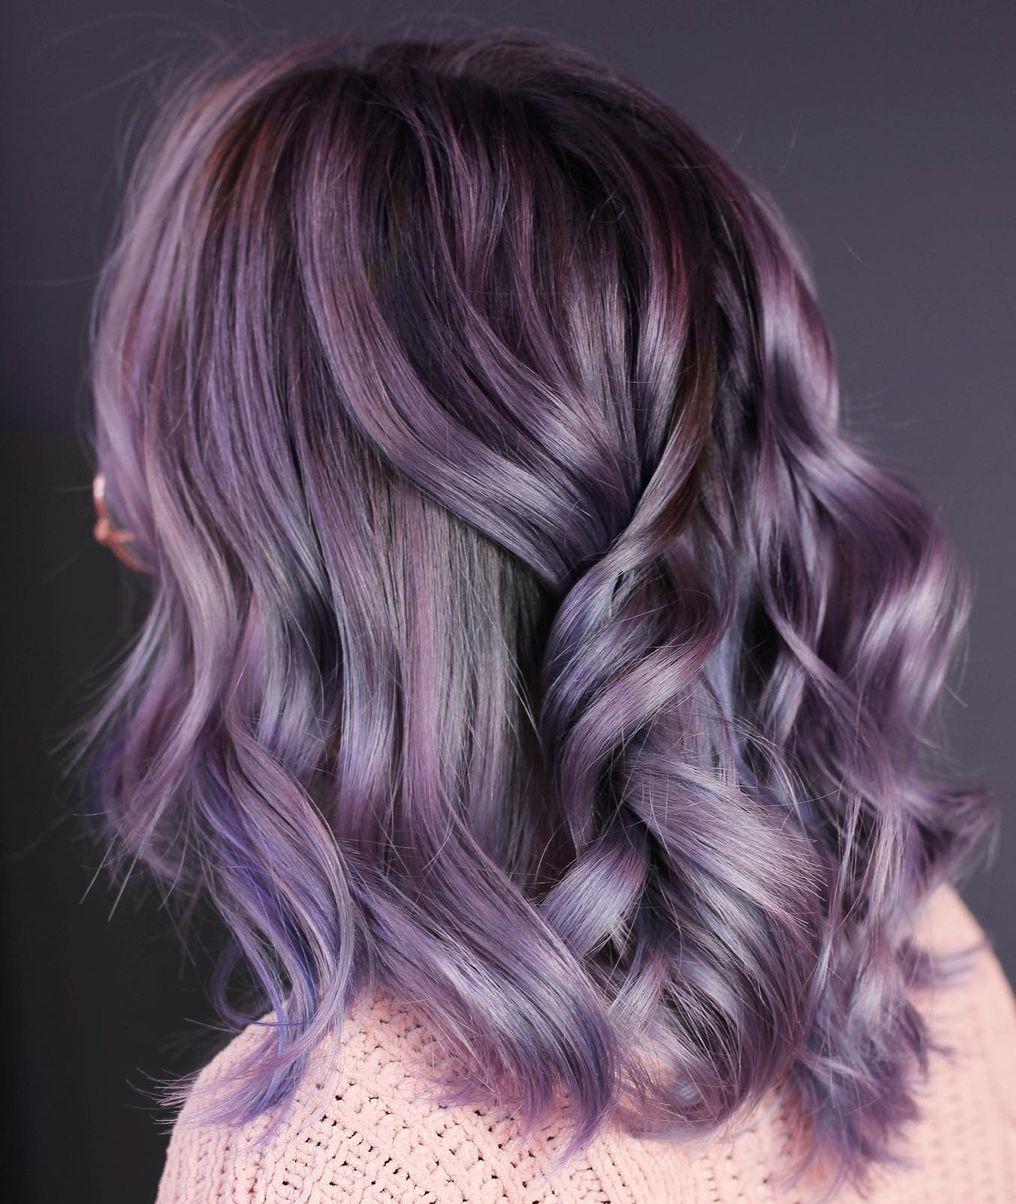 Vibrant Mauve Highlights for Dark Hair